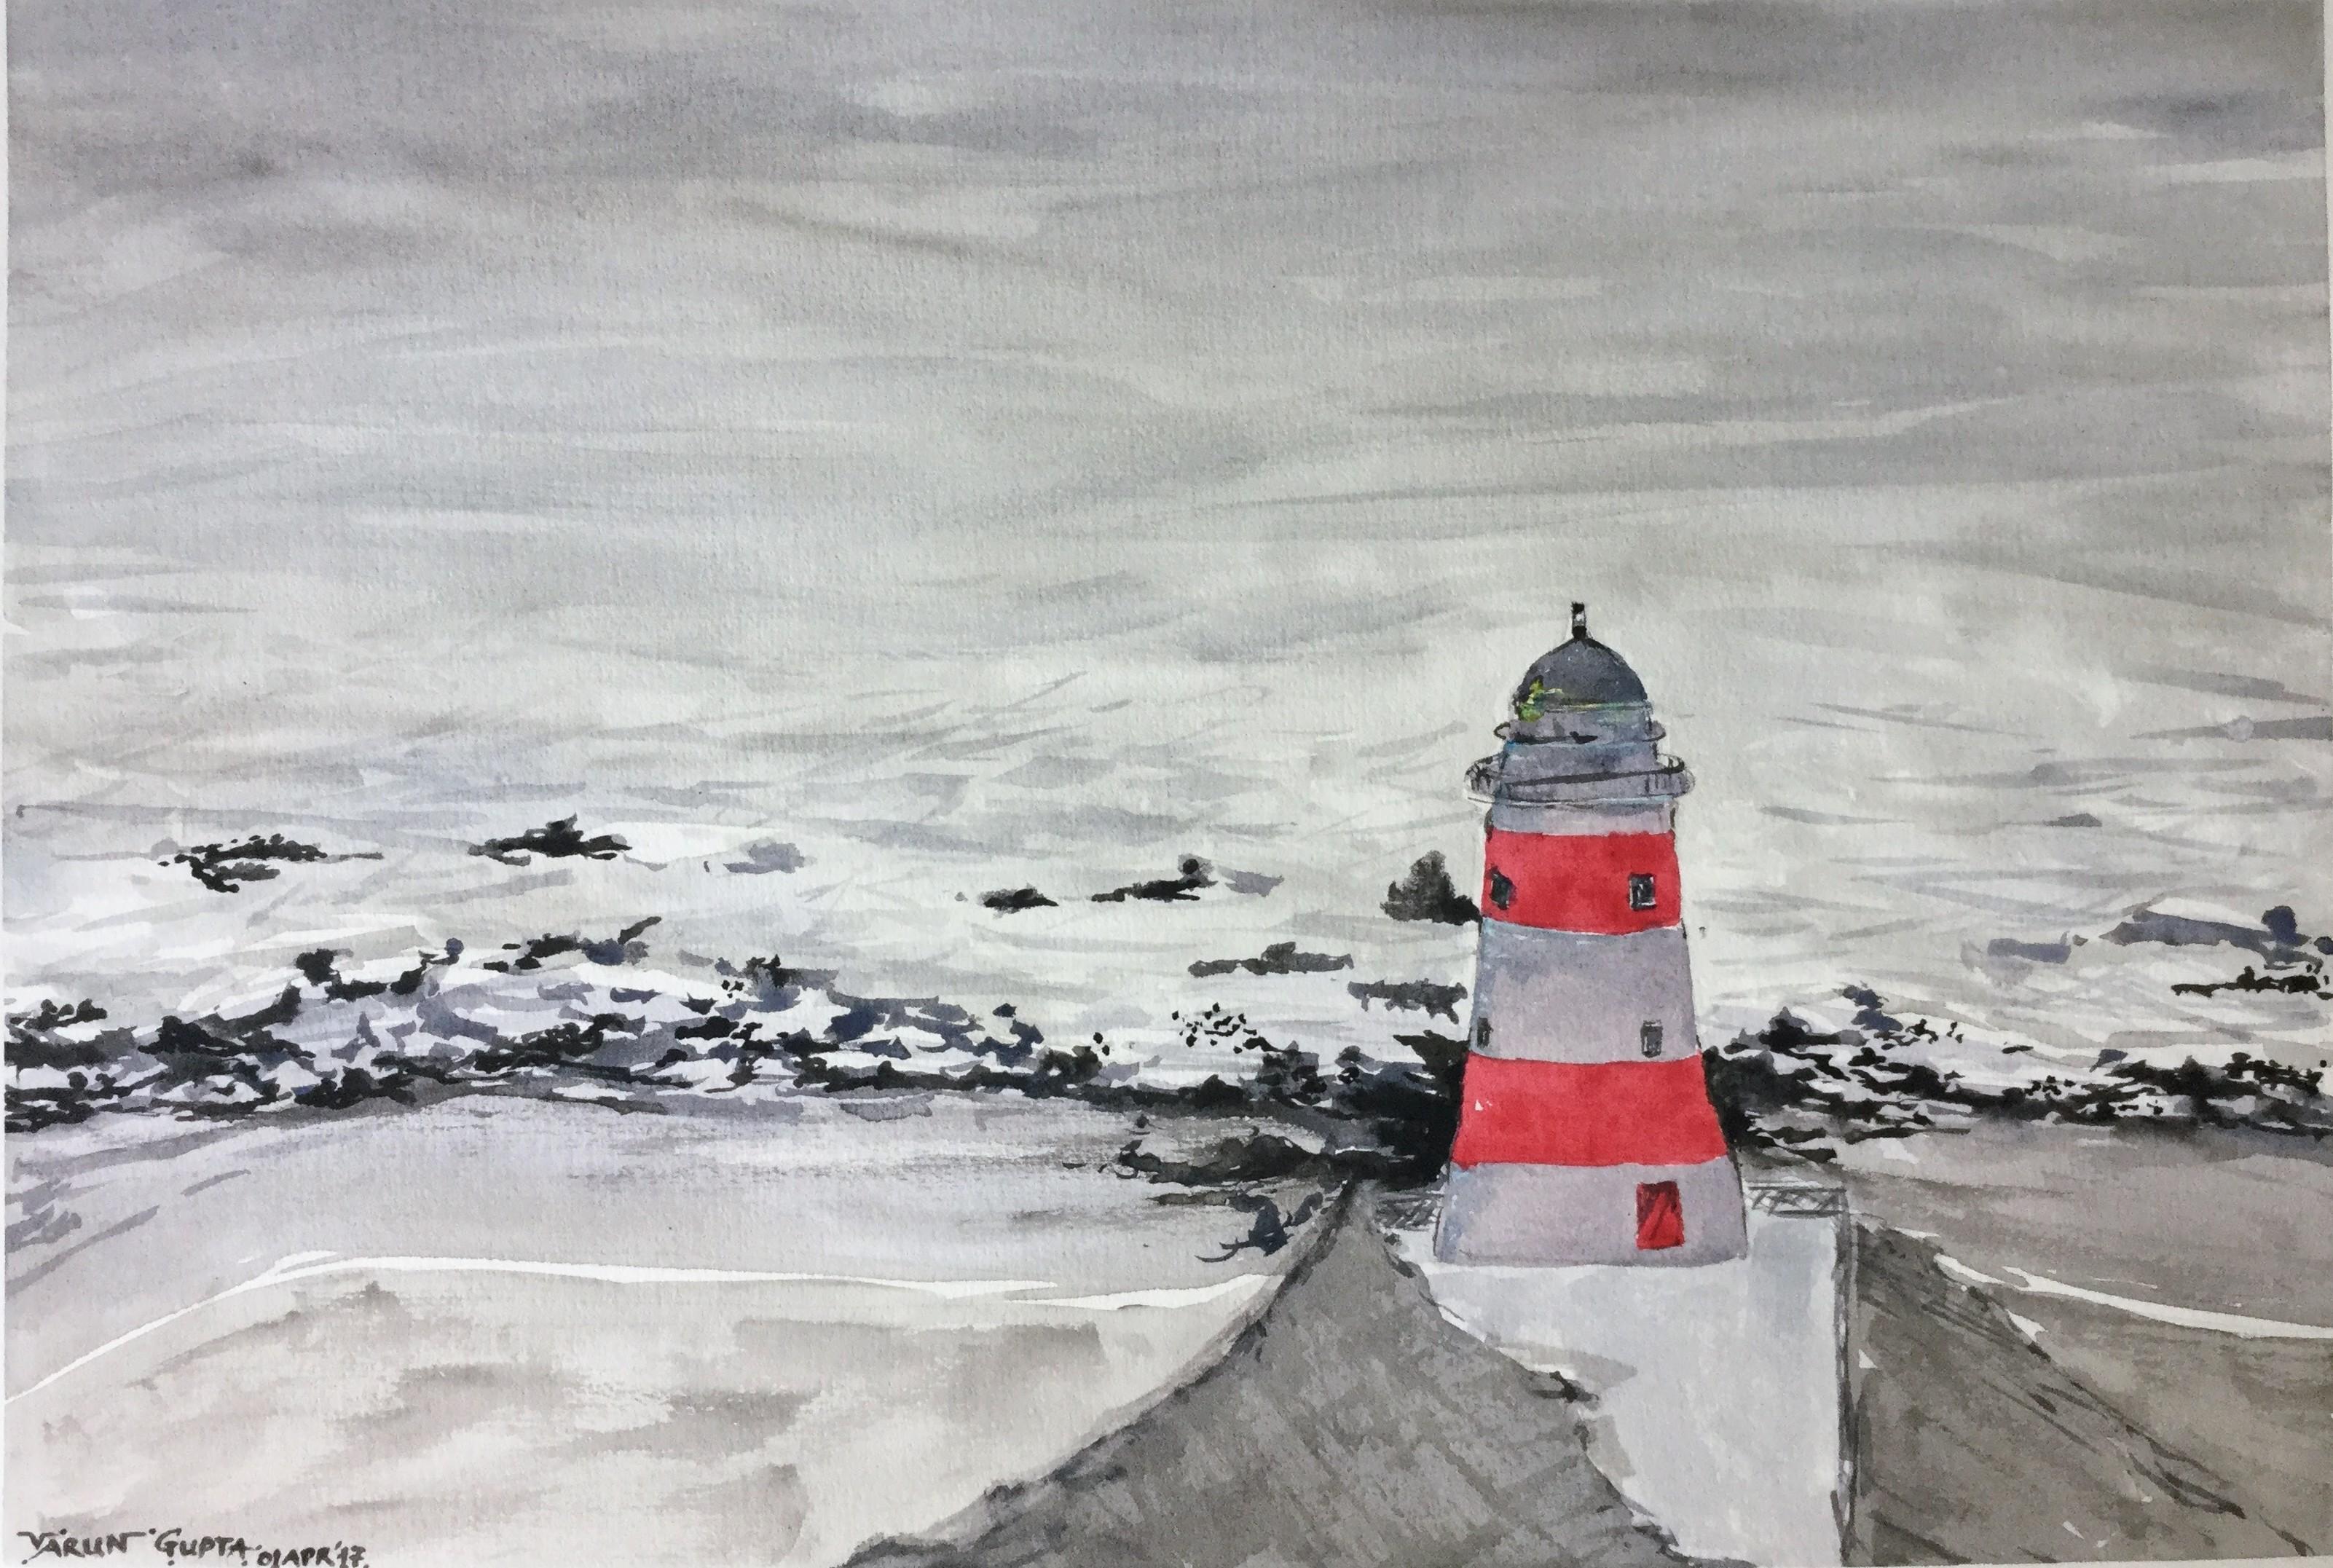 Cape Palliser - Meeting Horizon